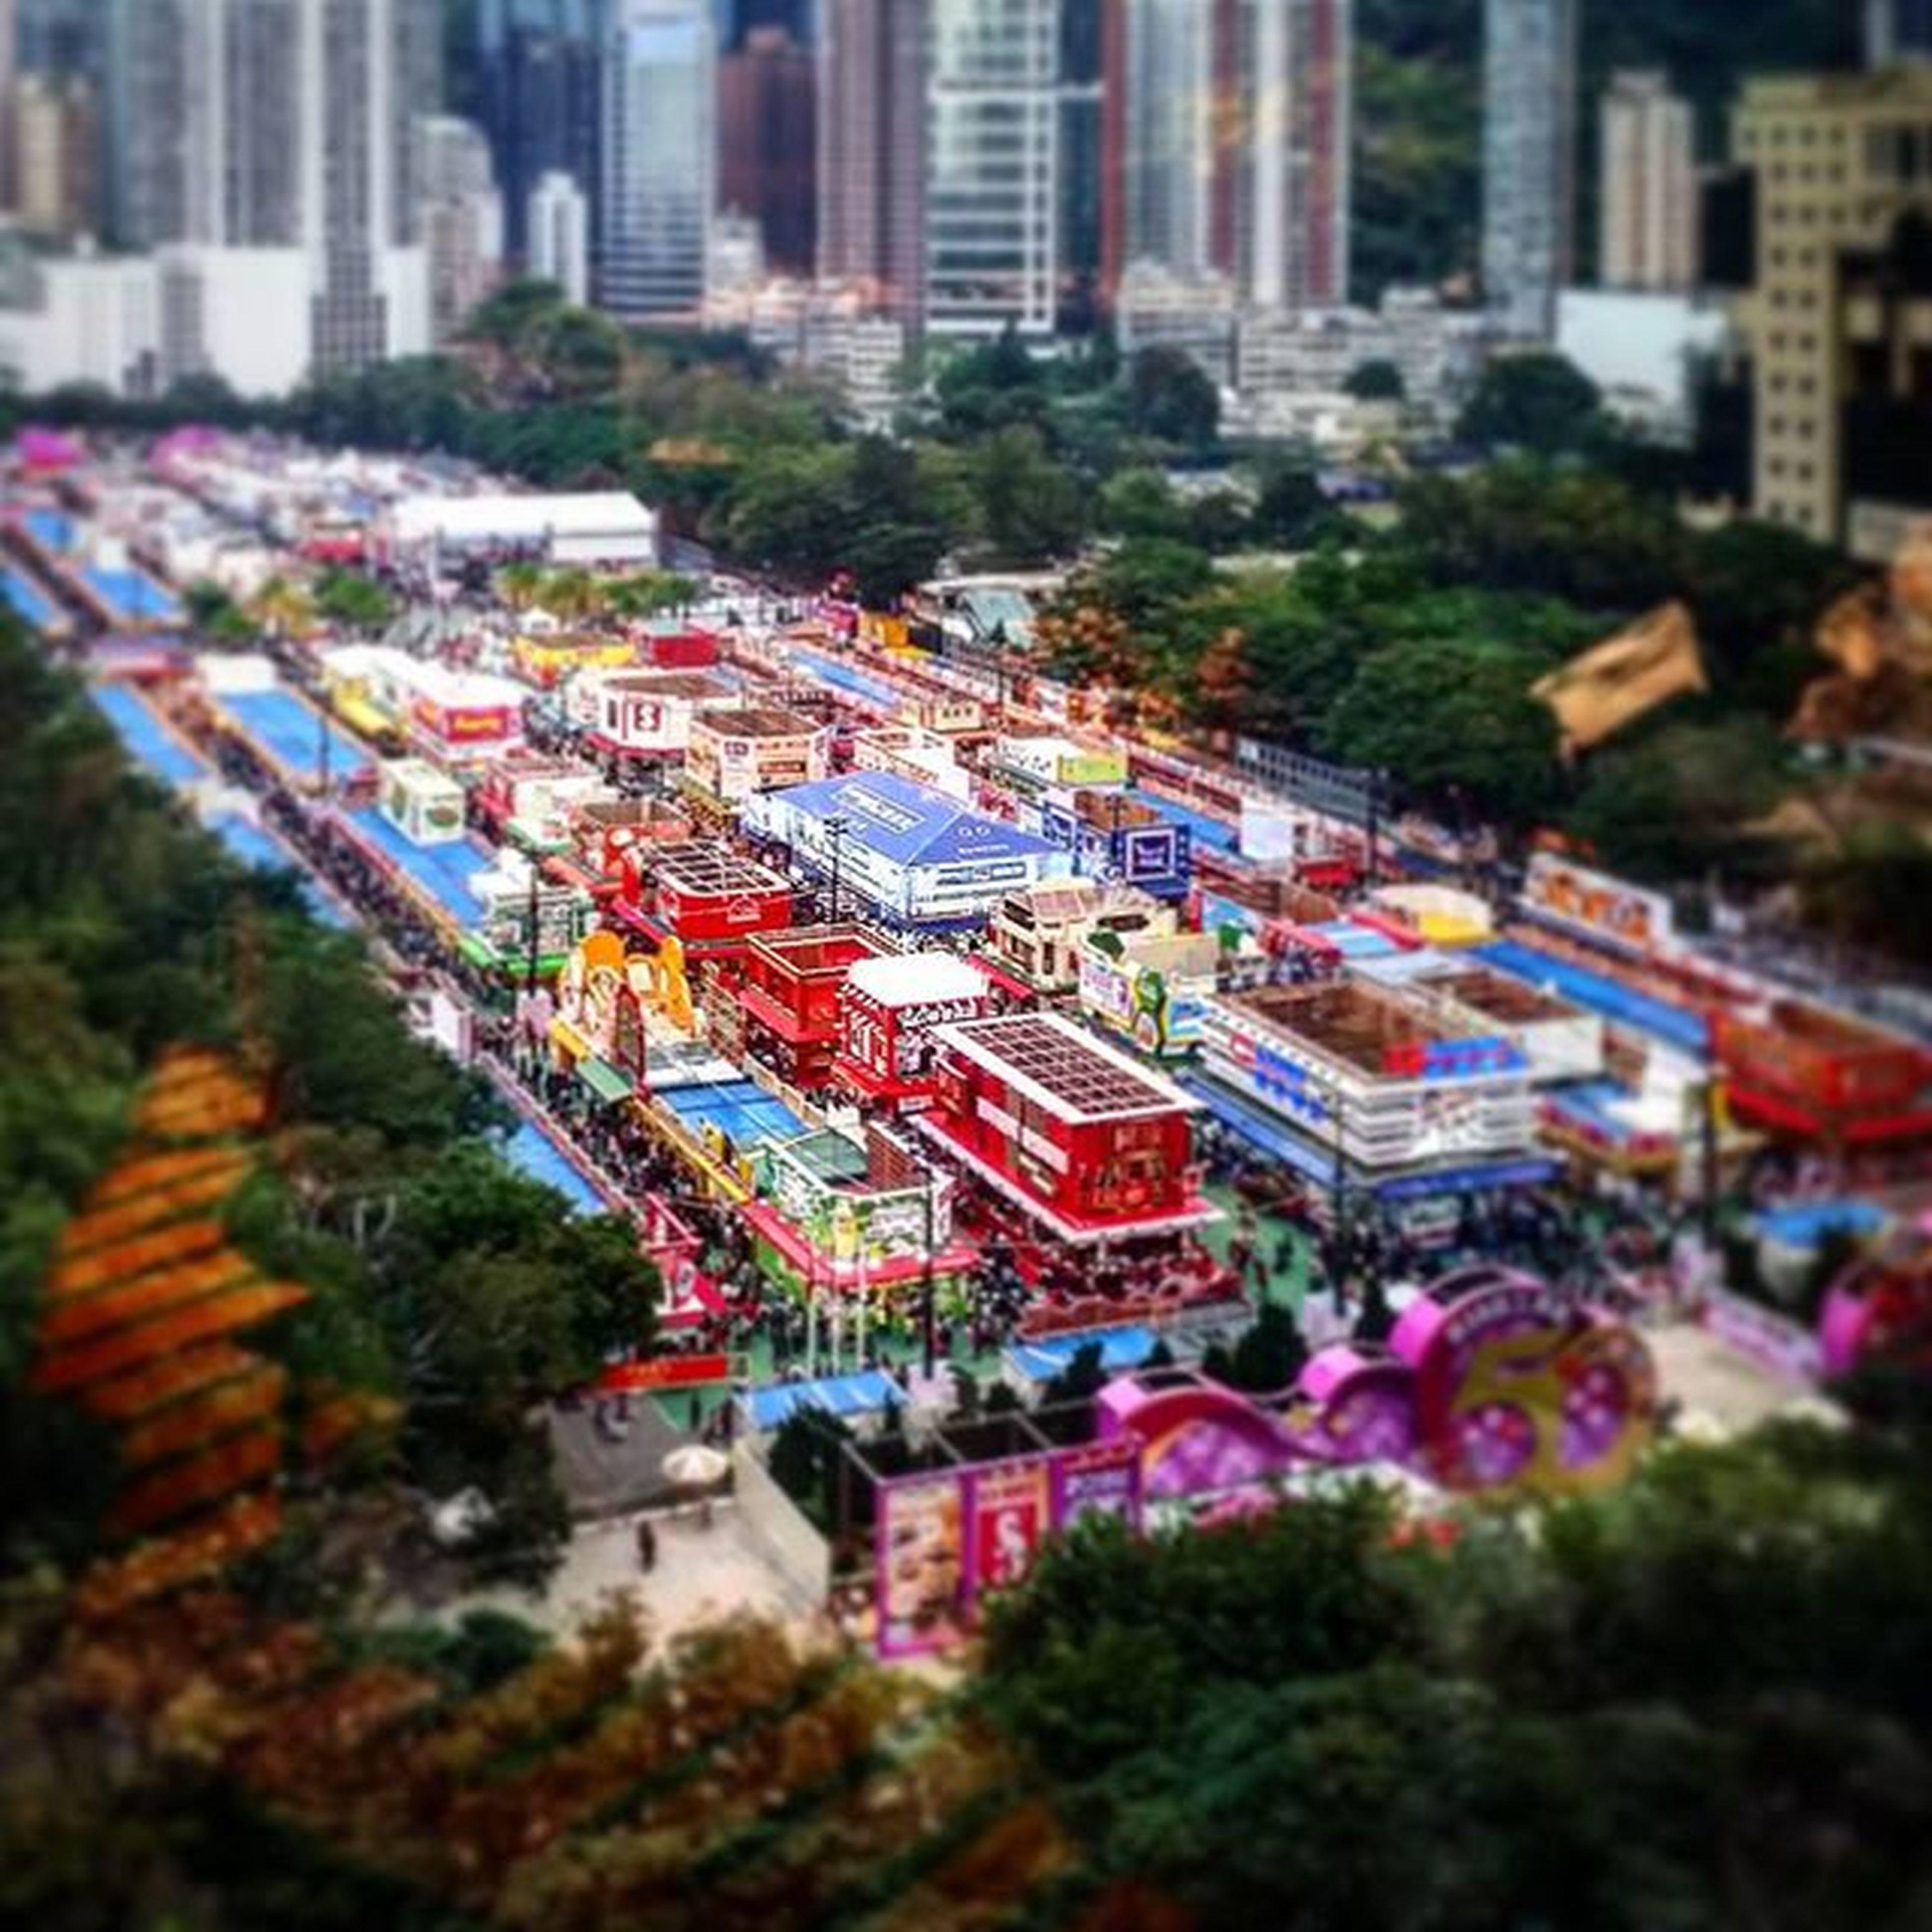 Drawwithlight Mobilephotography SamsungS5 Miniature 工展會 Hongkongphotography Hk Hkig 手機攝影